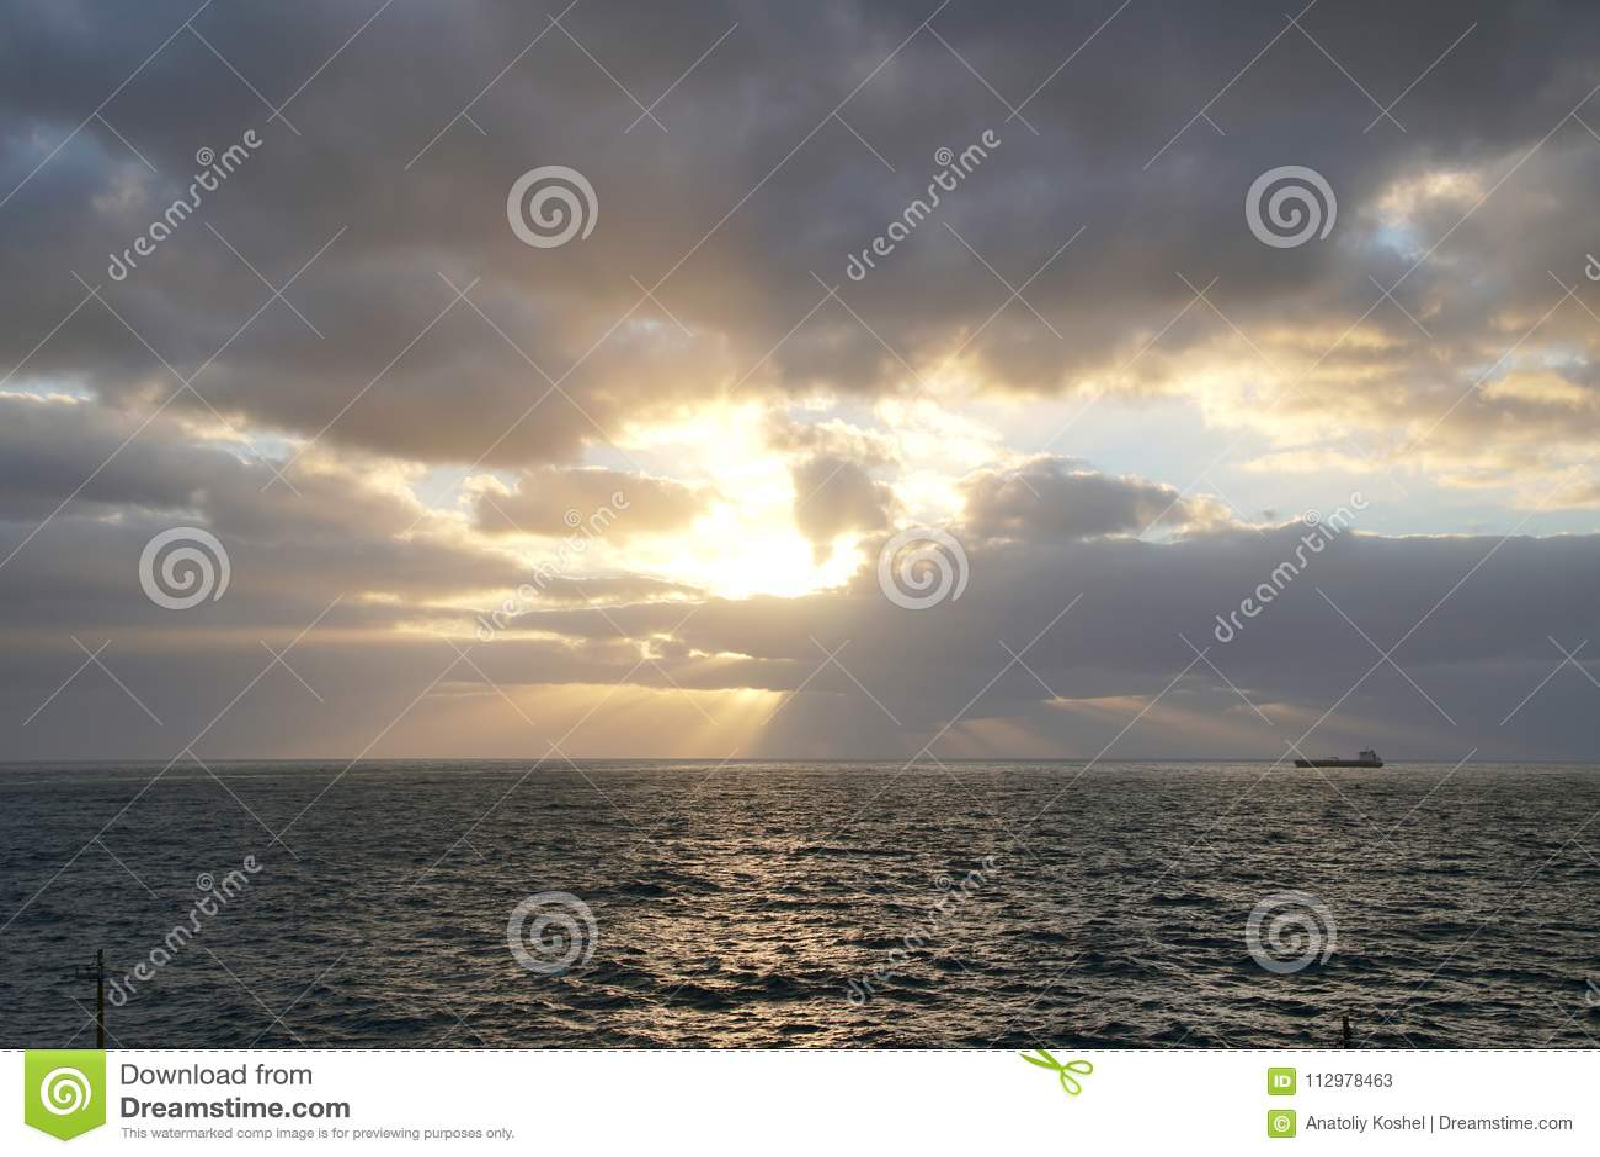 Magical ocean. Sunrise over the Atlantic. Morning. Waves